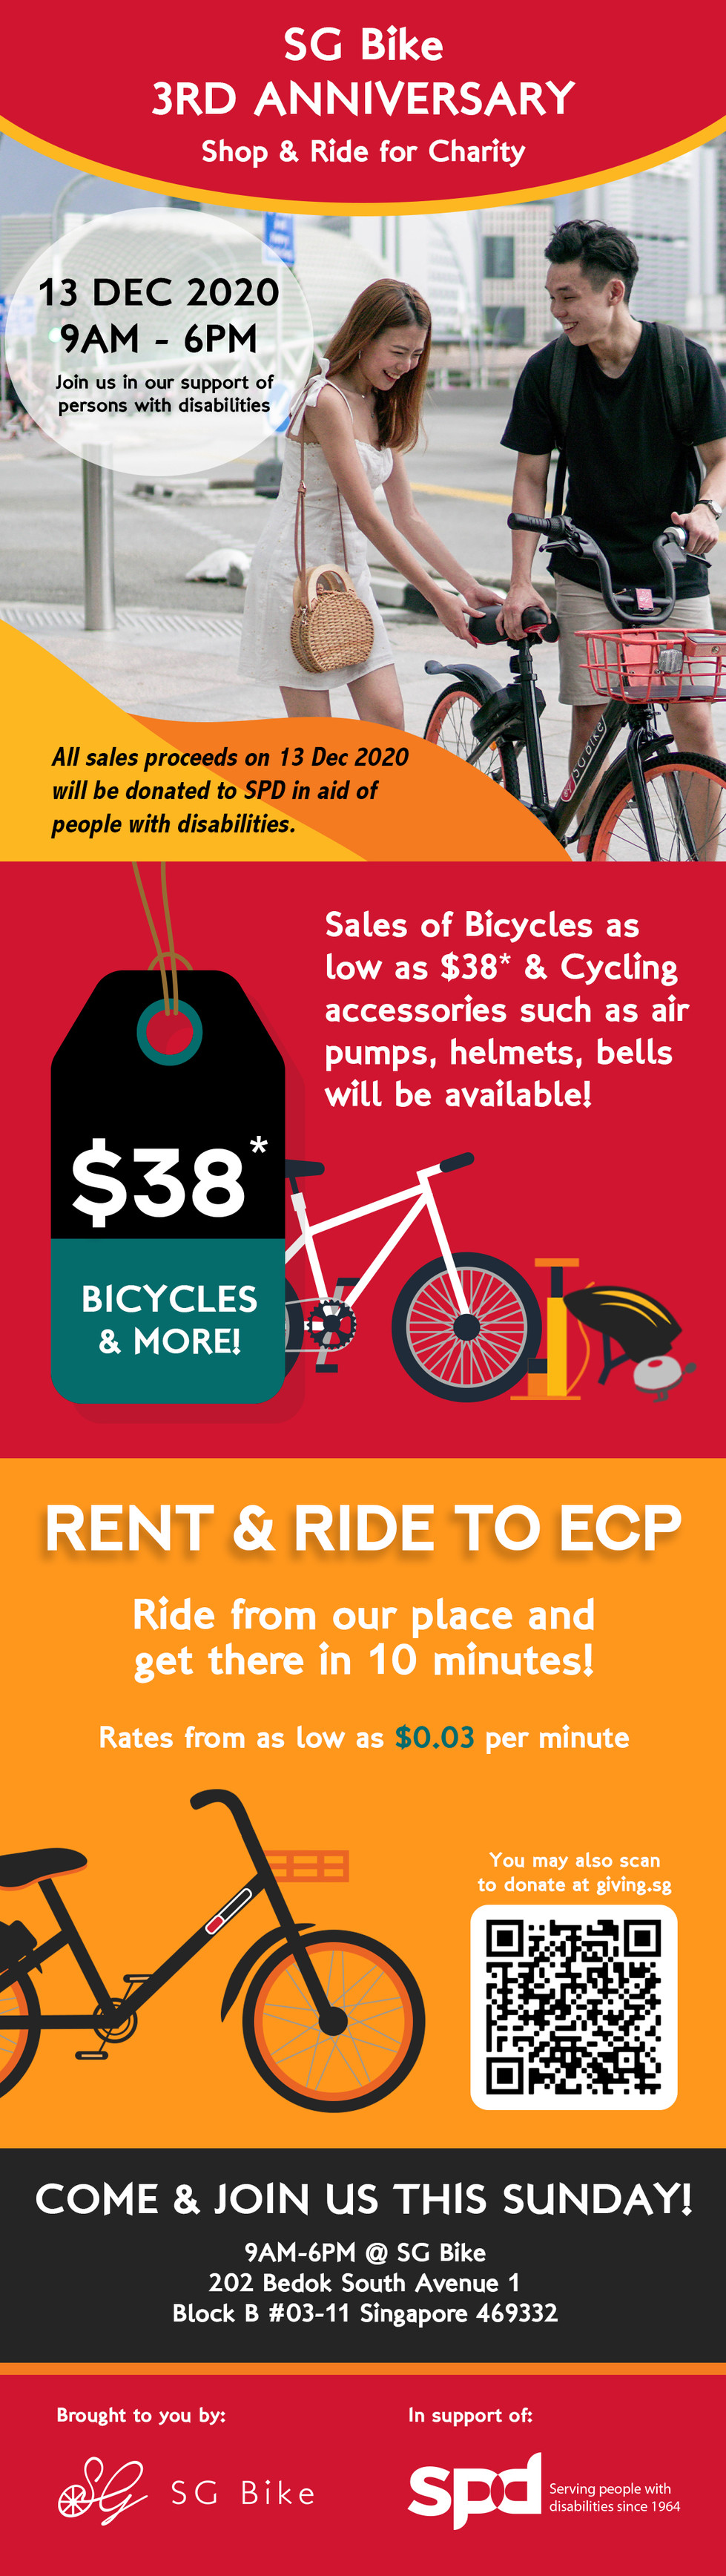 SG Bike 3rd Anniversary Sales EDM_11 Dec.jpg